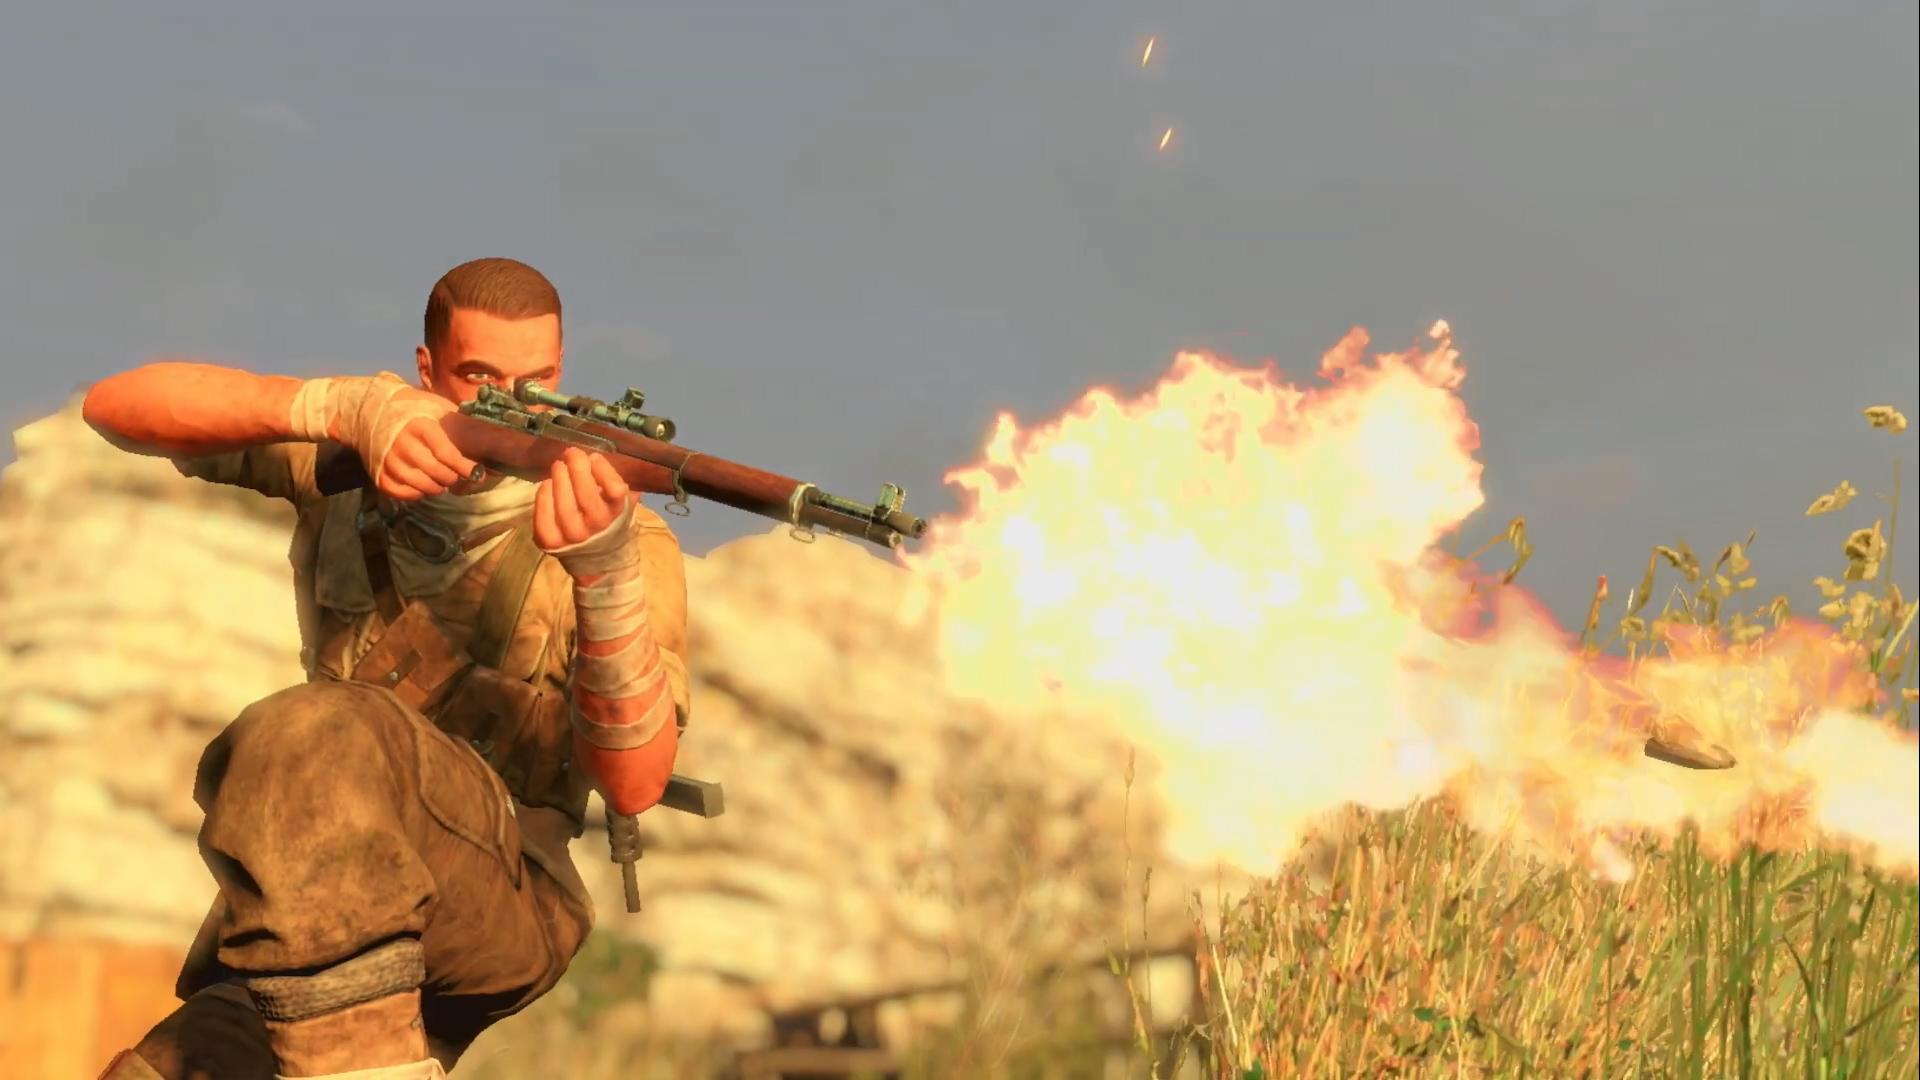 狙擊之神, 狙擊精英3, Sniper Elite 3, NS, GSE,